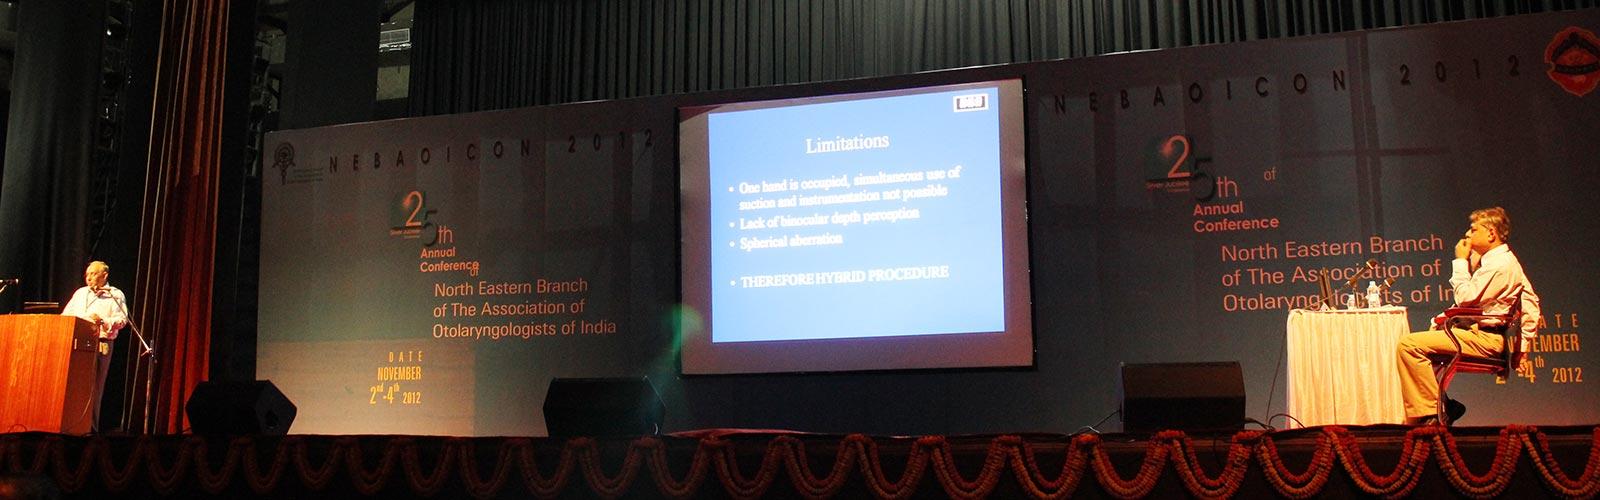 NEBAOI-25th-Conference-2012